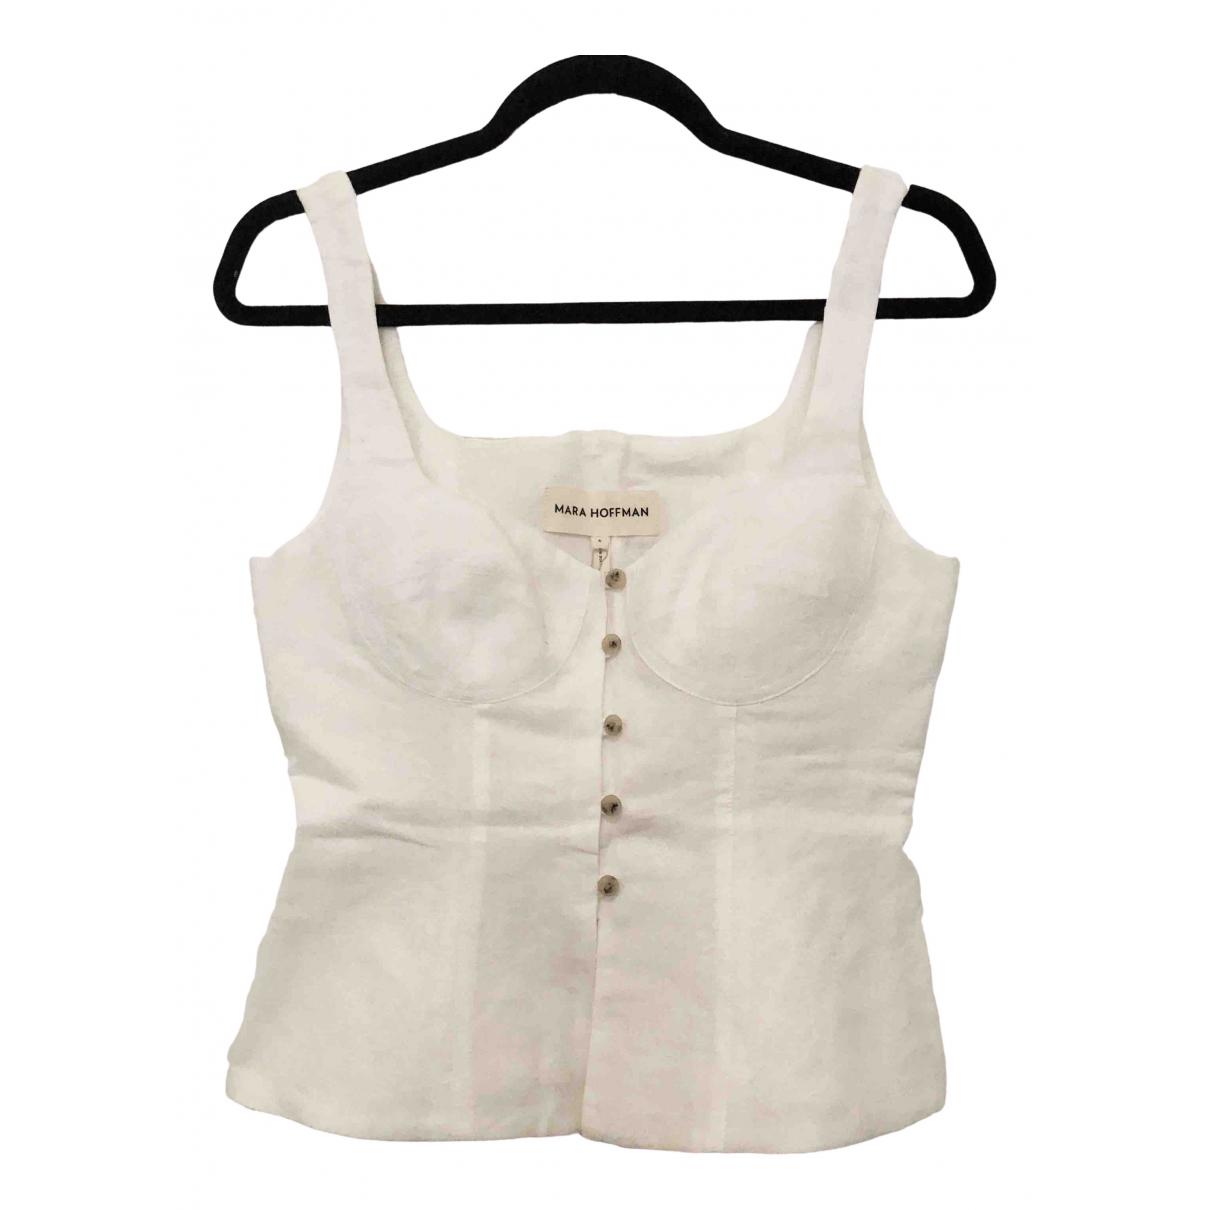 Mara Hoffman - Top   pour femme en lin - blanc